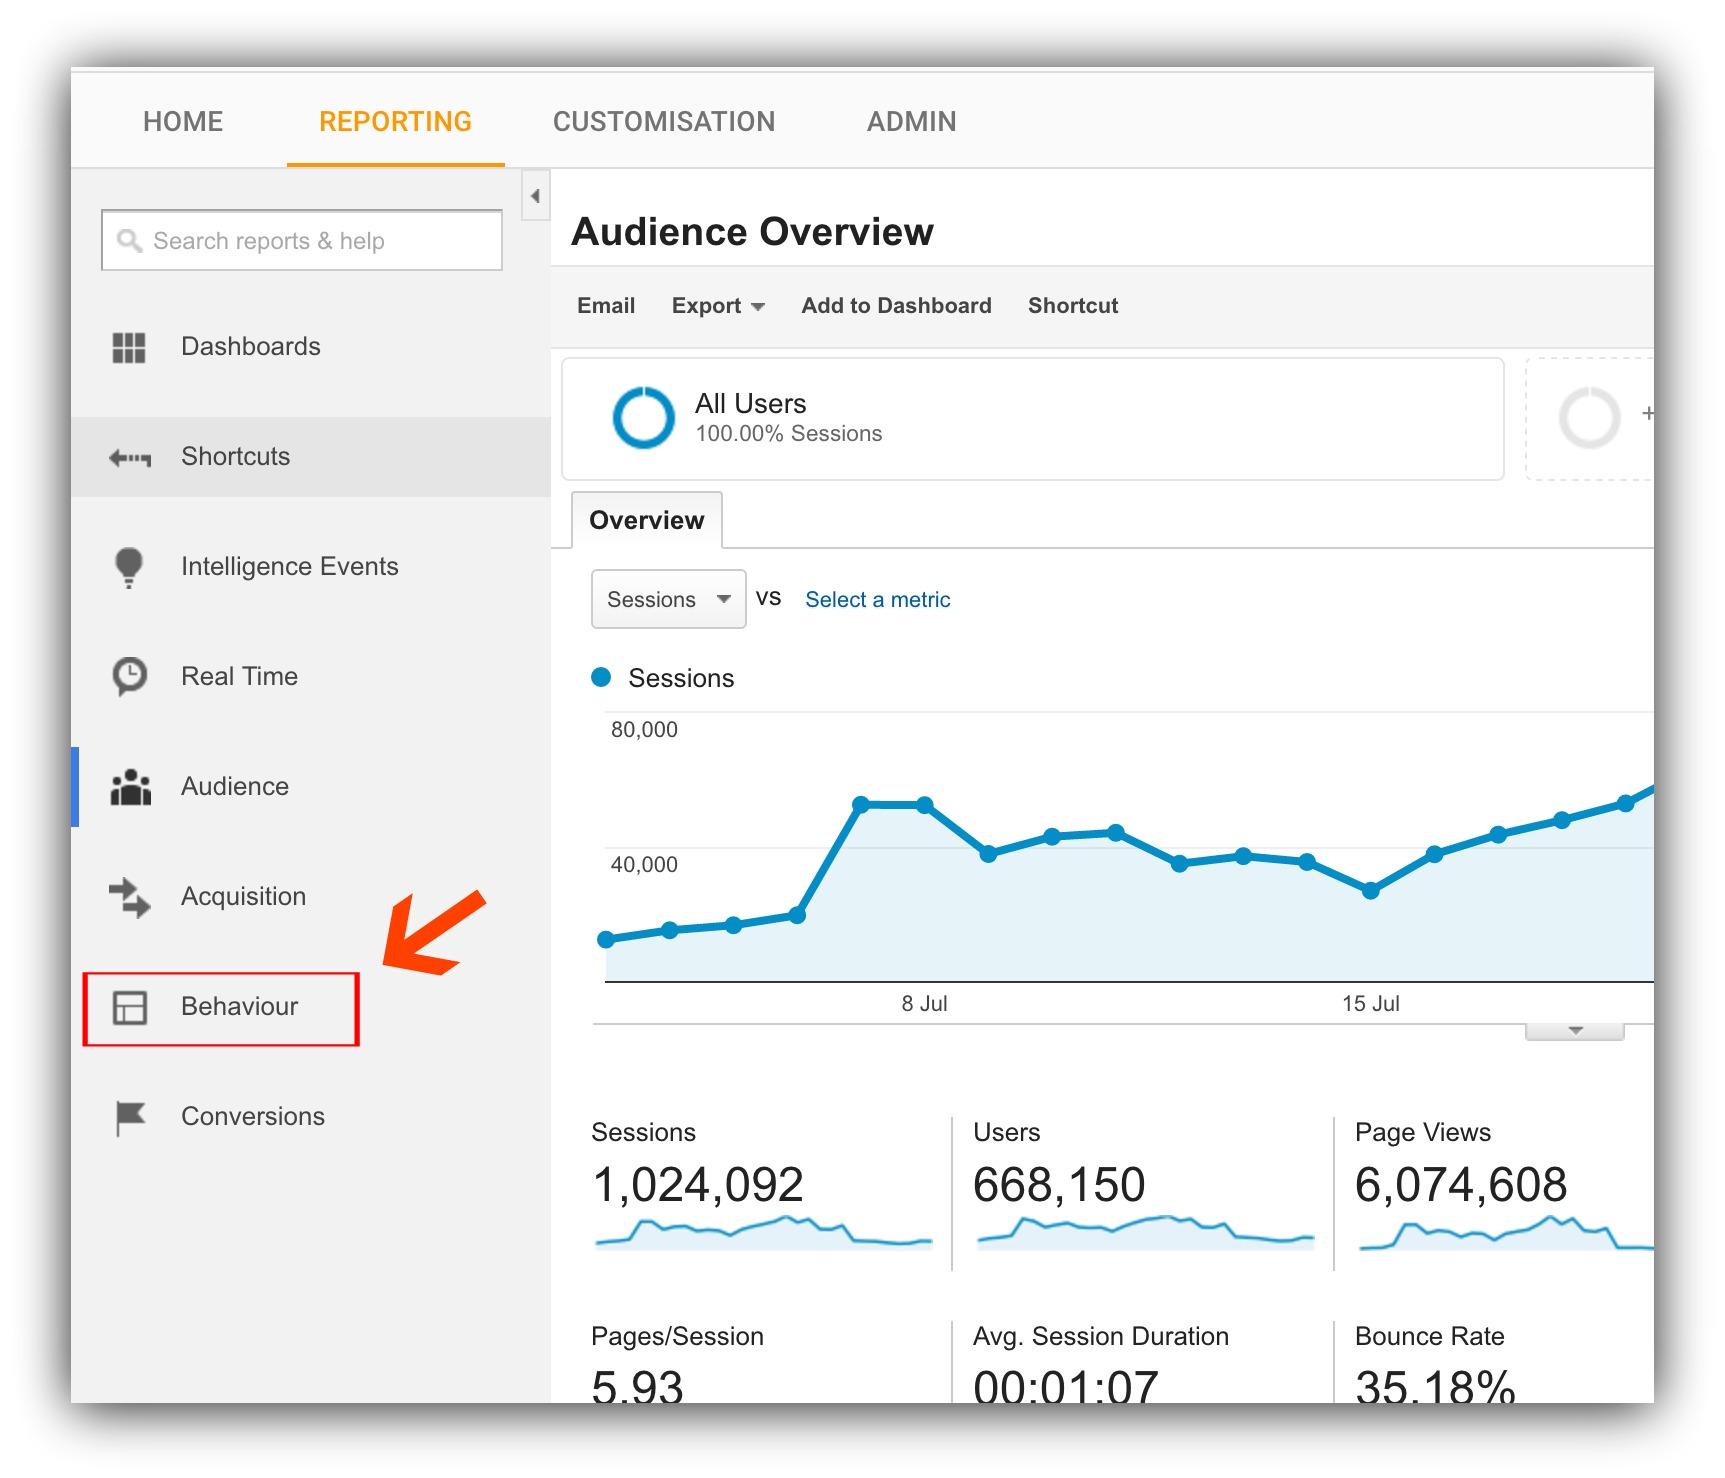 Screenshot showing google analytics dashboard page